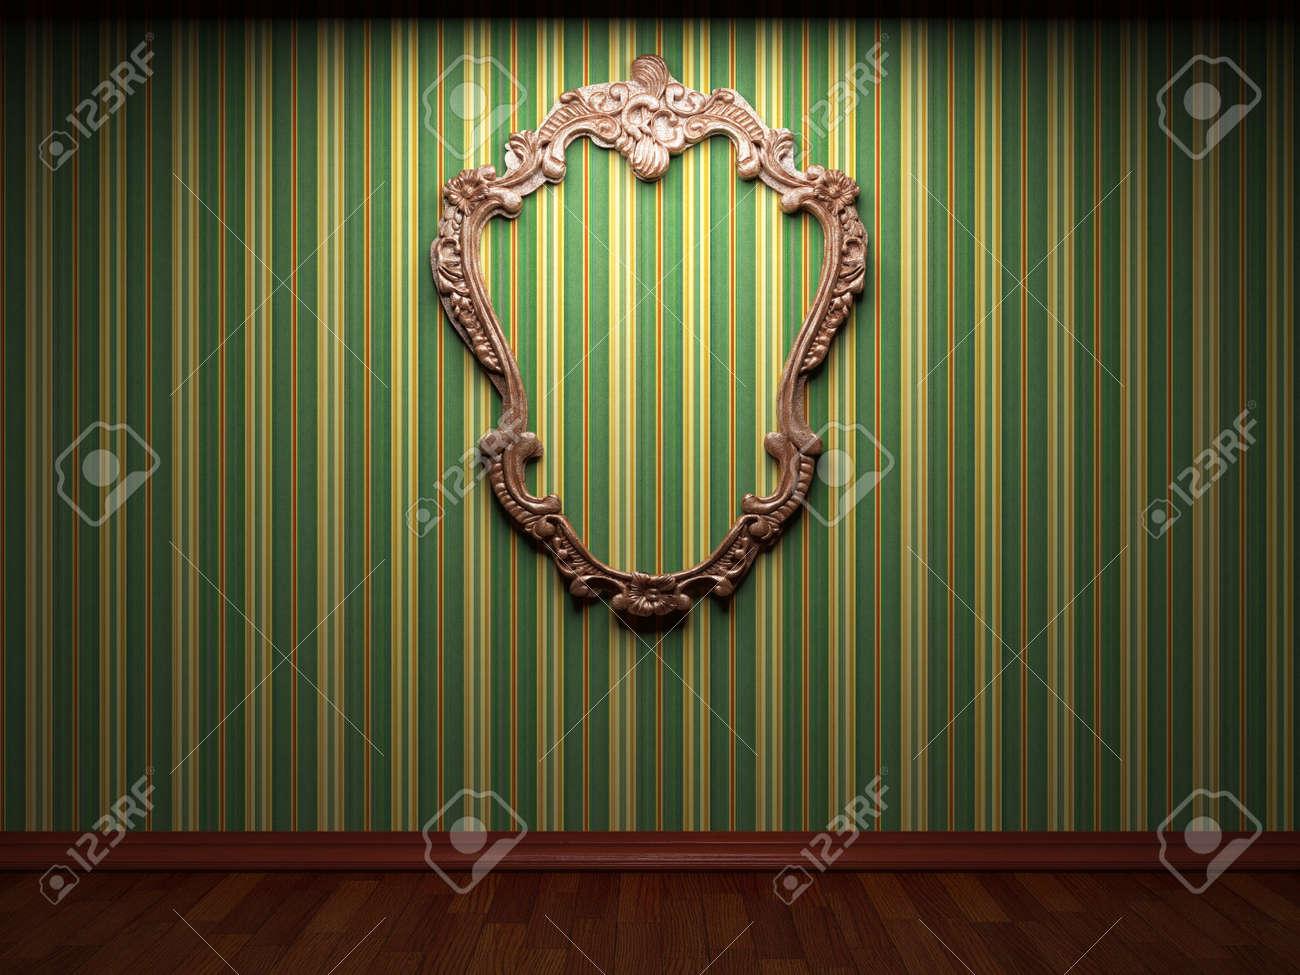 illuminated fabric wall and frame Stock Photo - 7035708